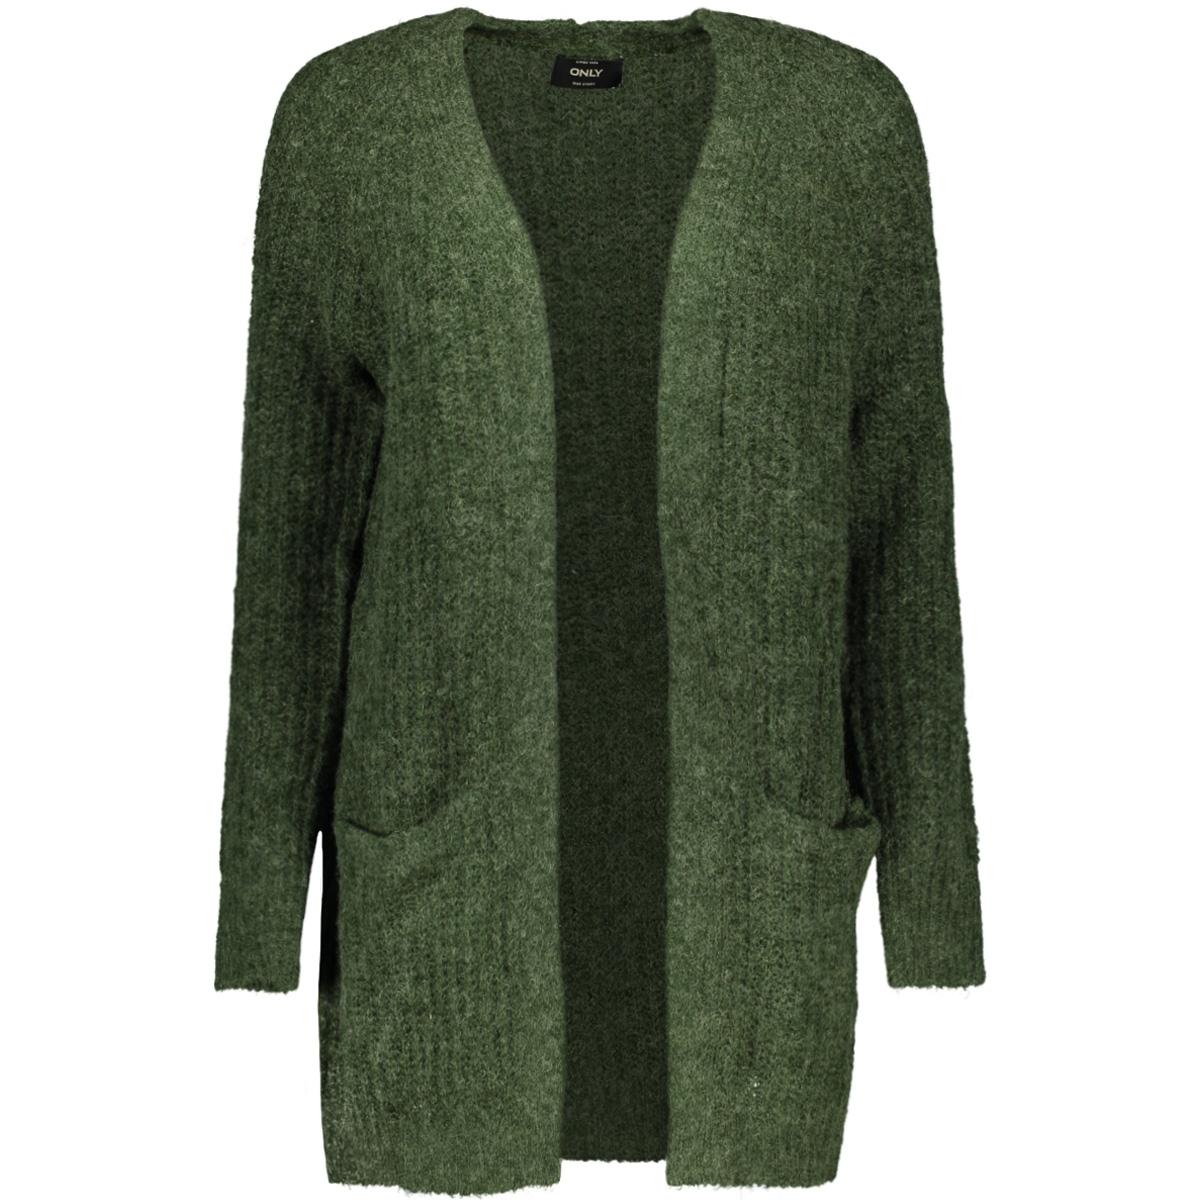 onlvega l/s cardigan knt 15160729 only vest hunter green